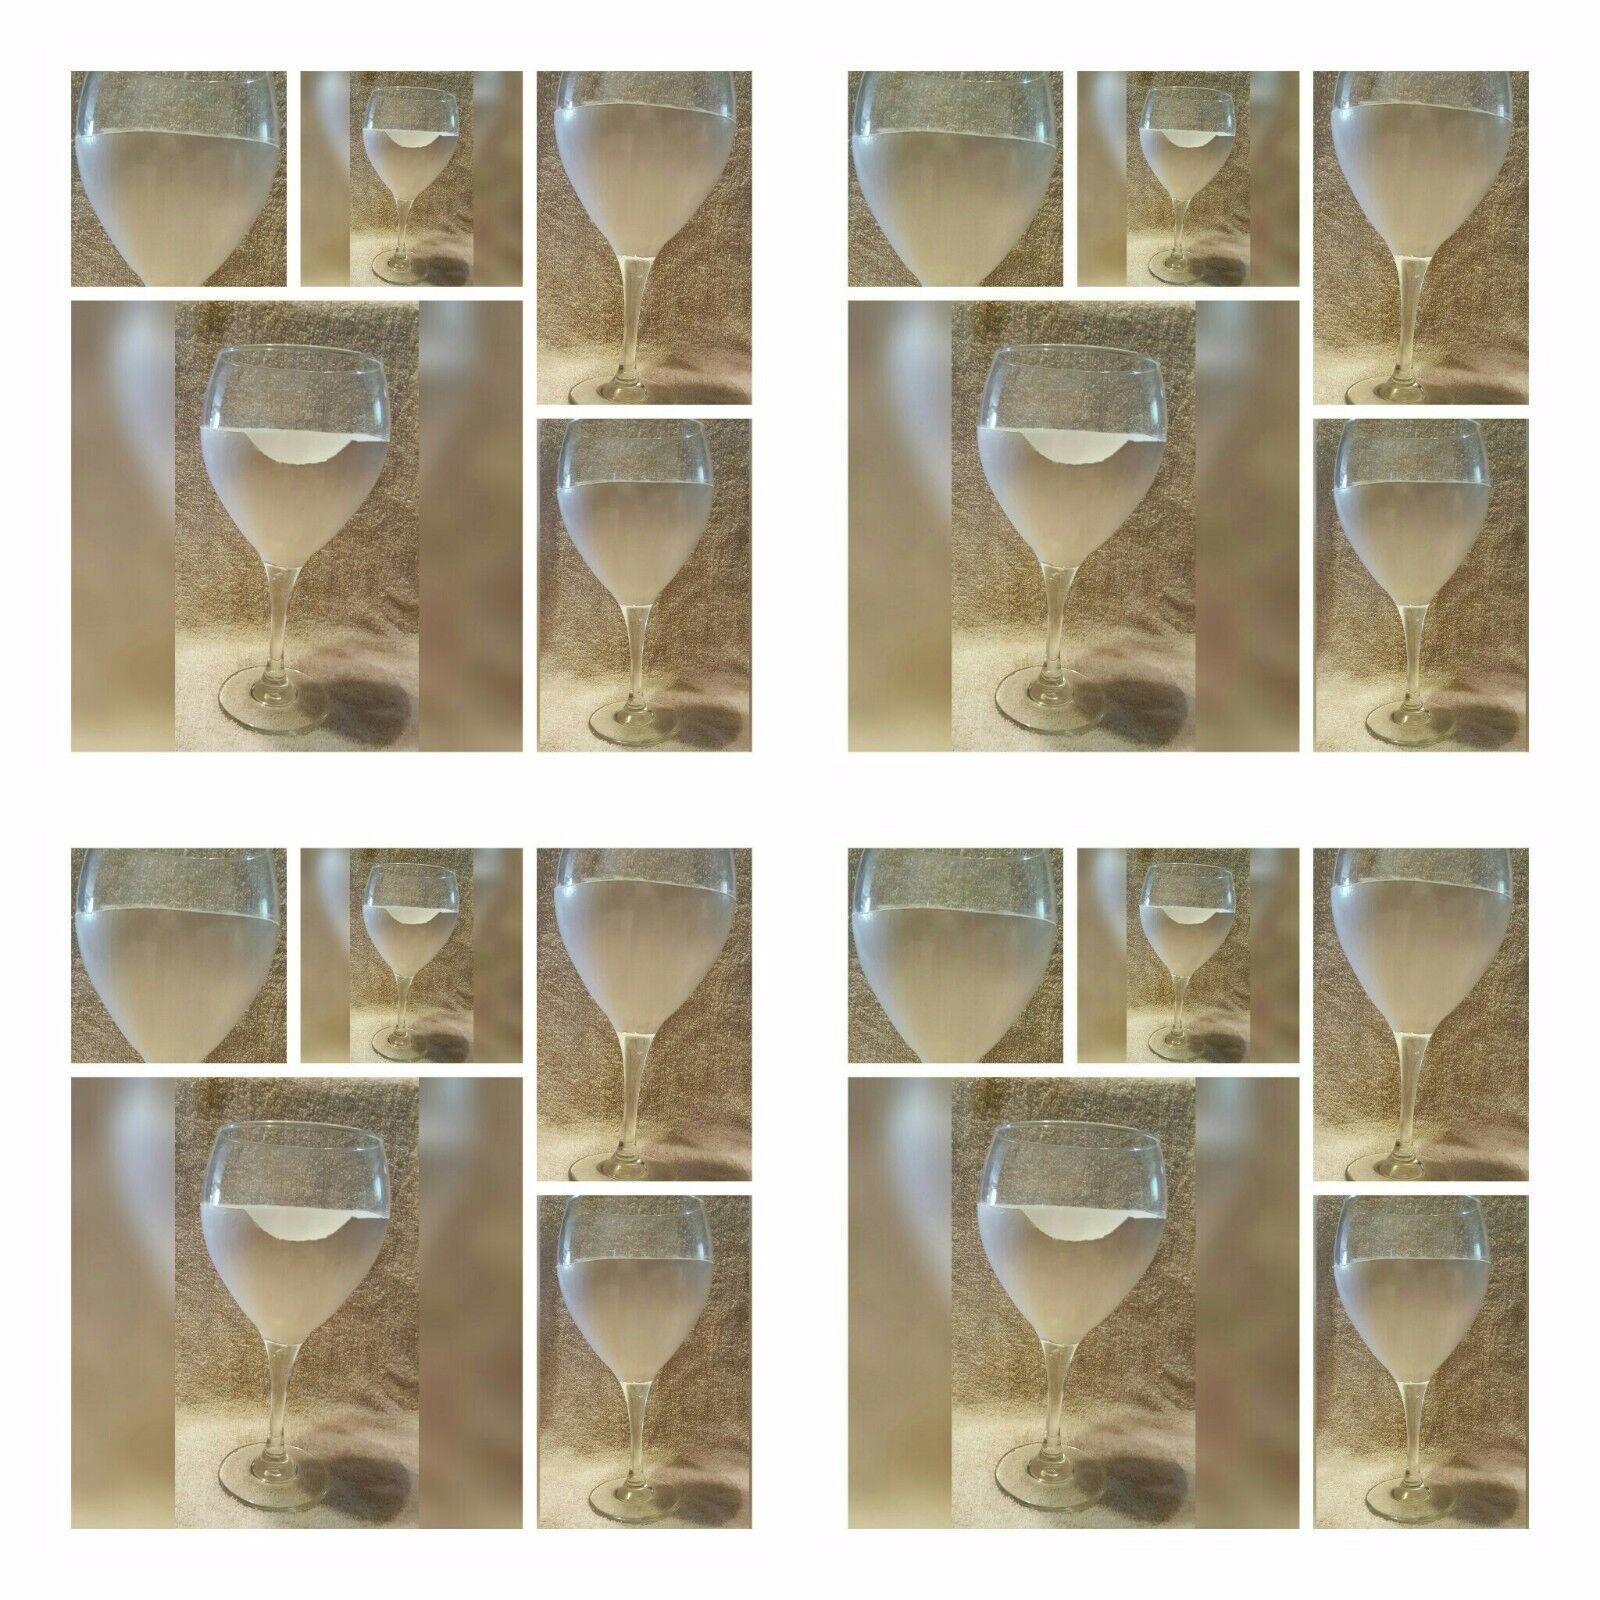 Bridal Shower, SET OF 6, GUESTS DECORATING  GOBLET-Hand Painted